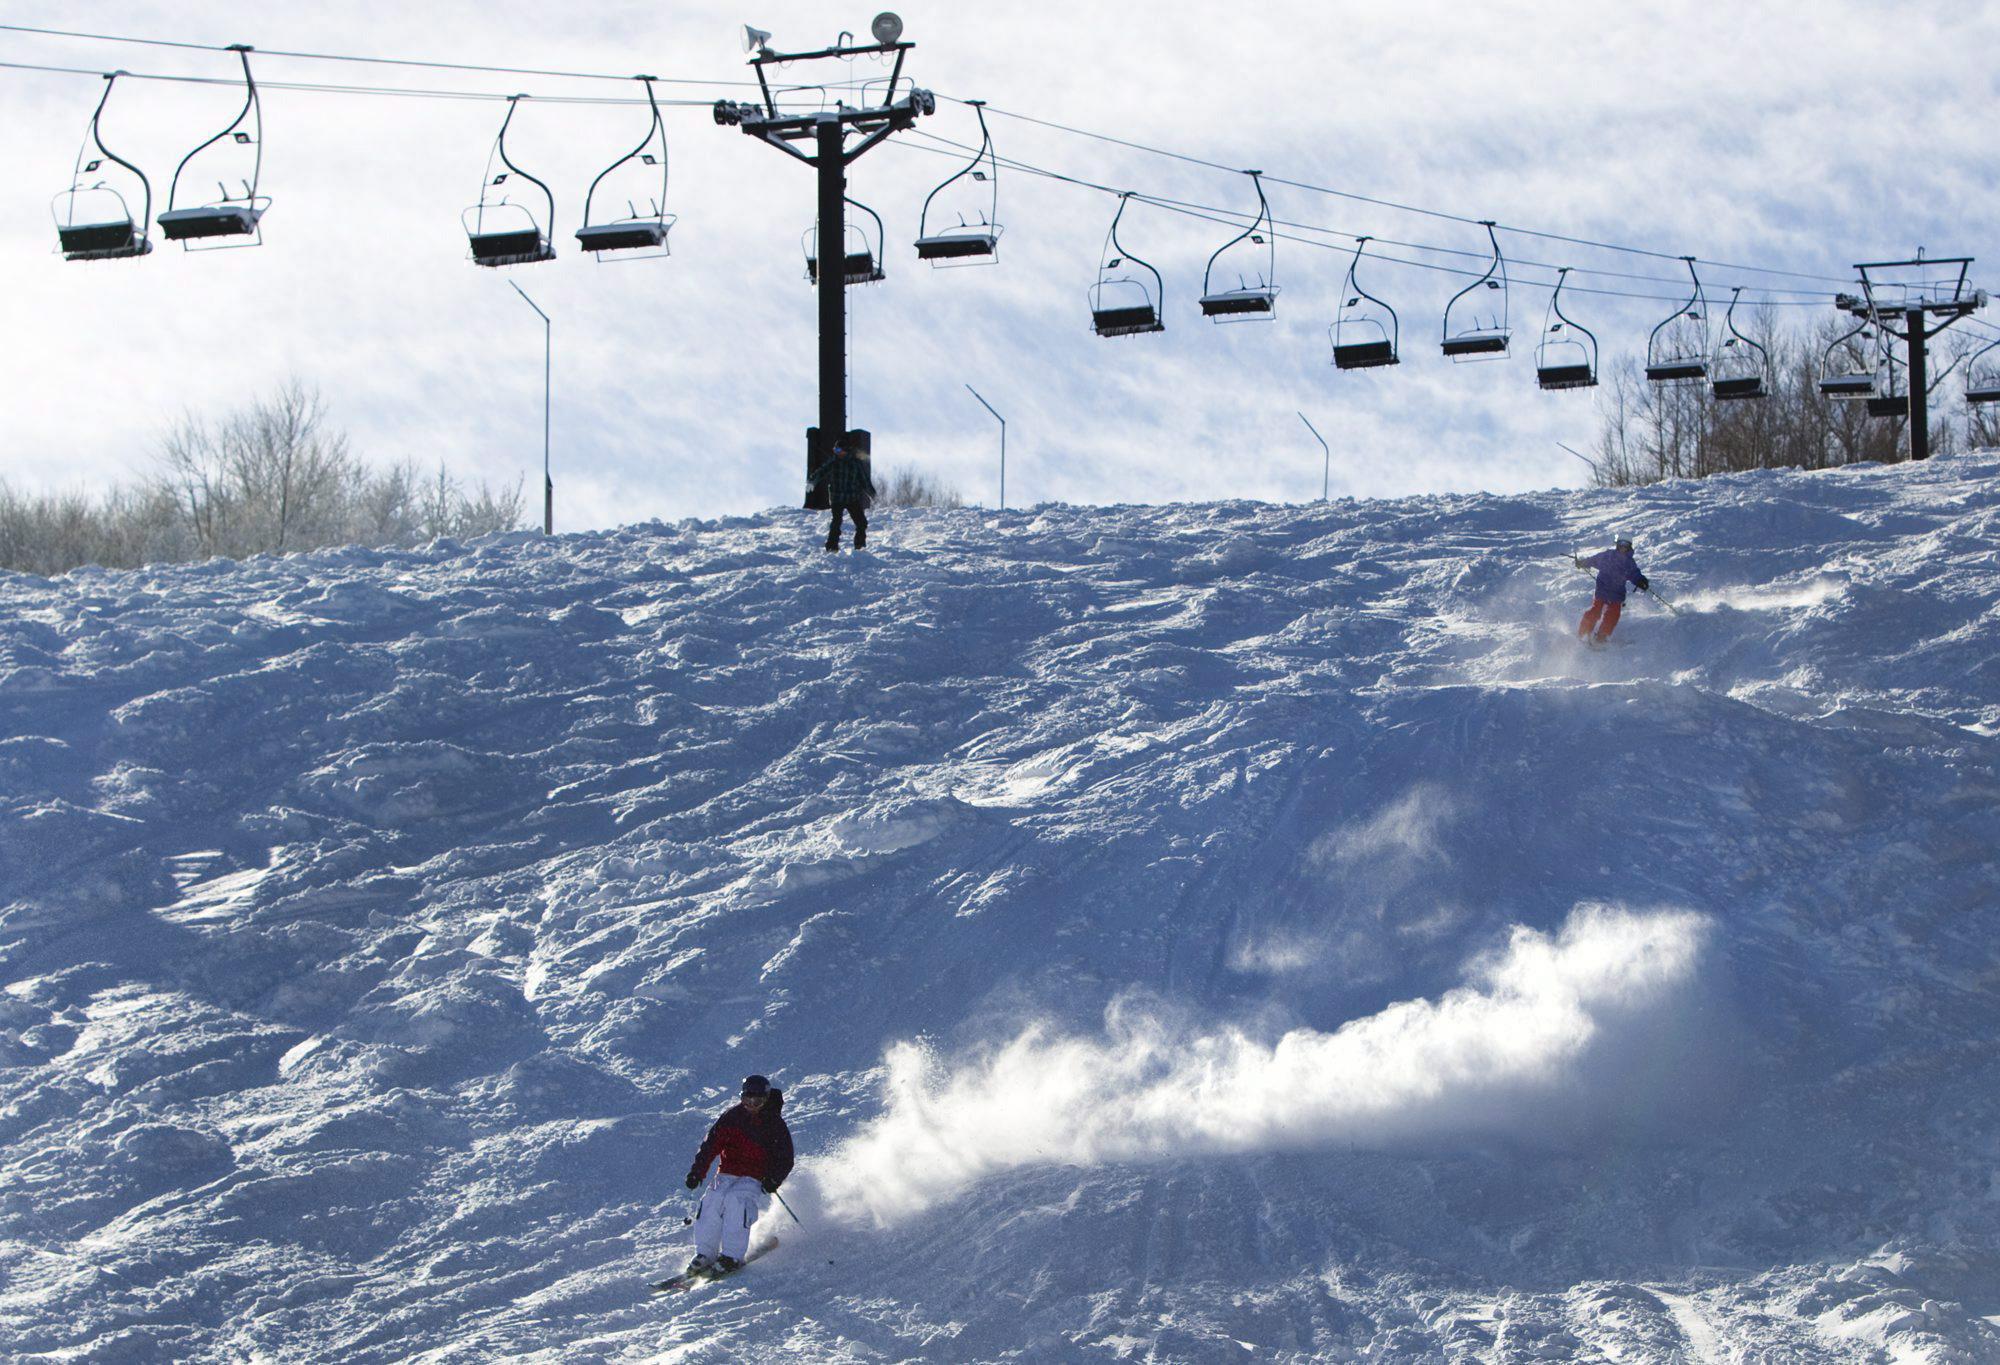 Skier descends down Blue Mountain hill